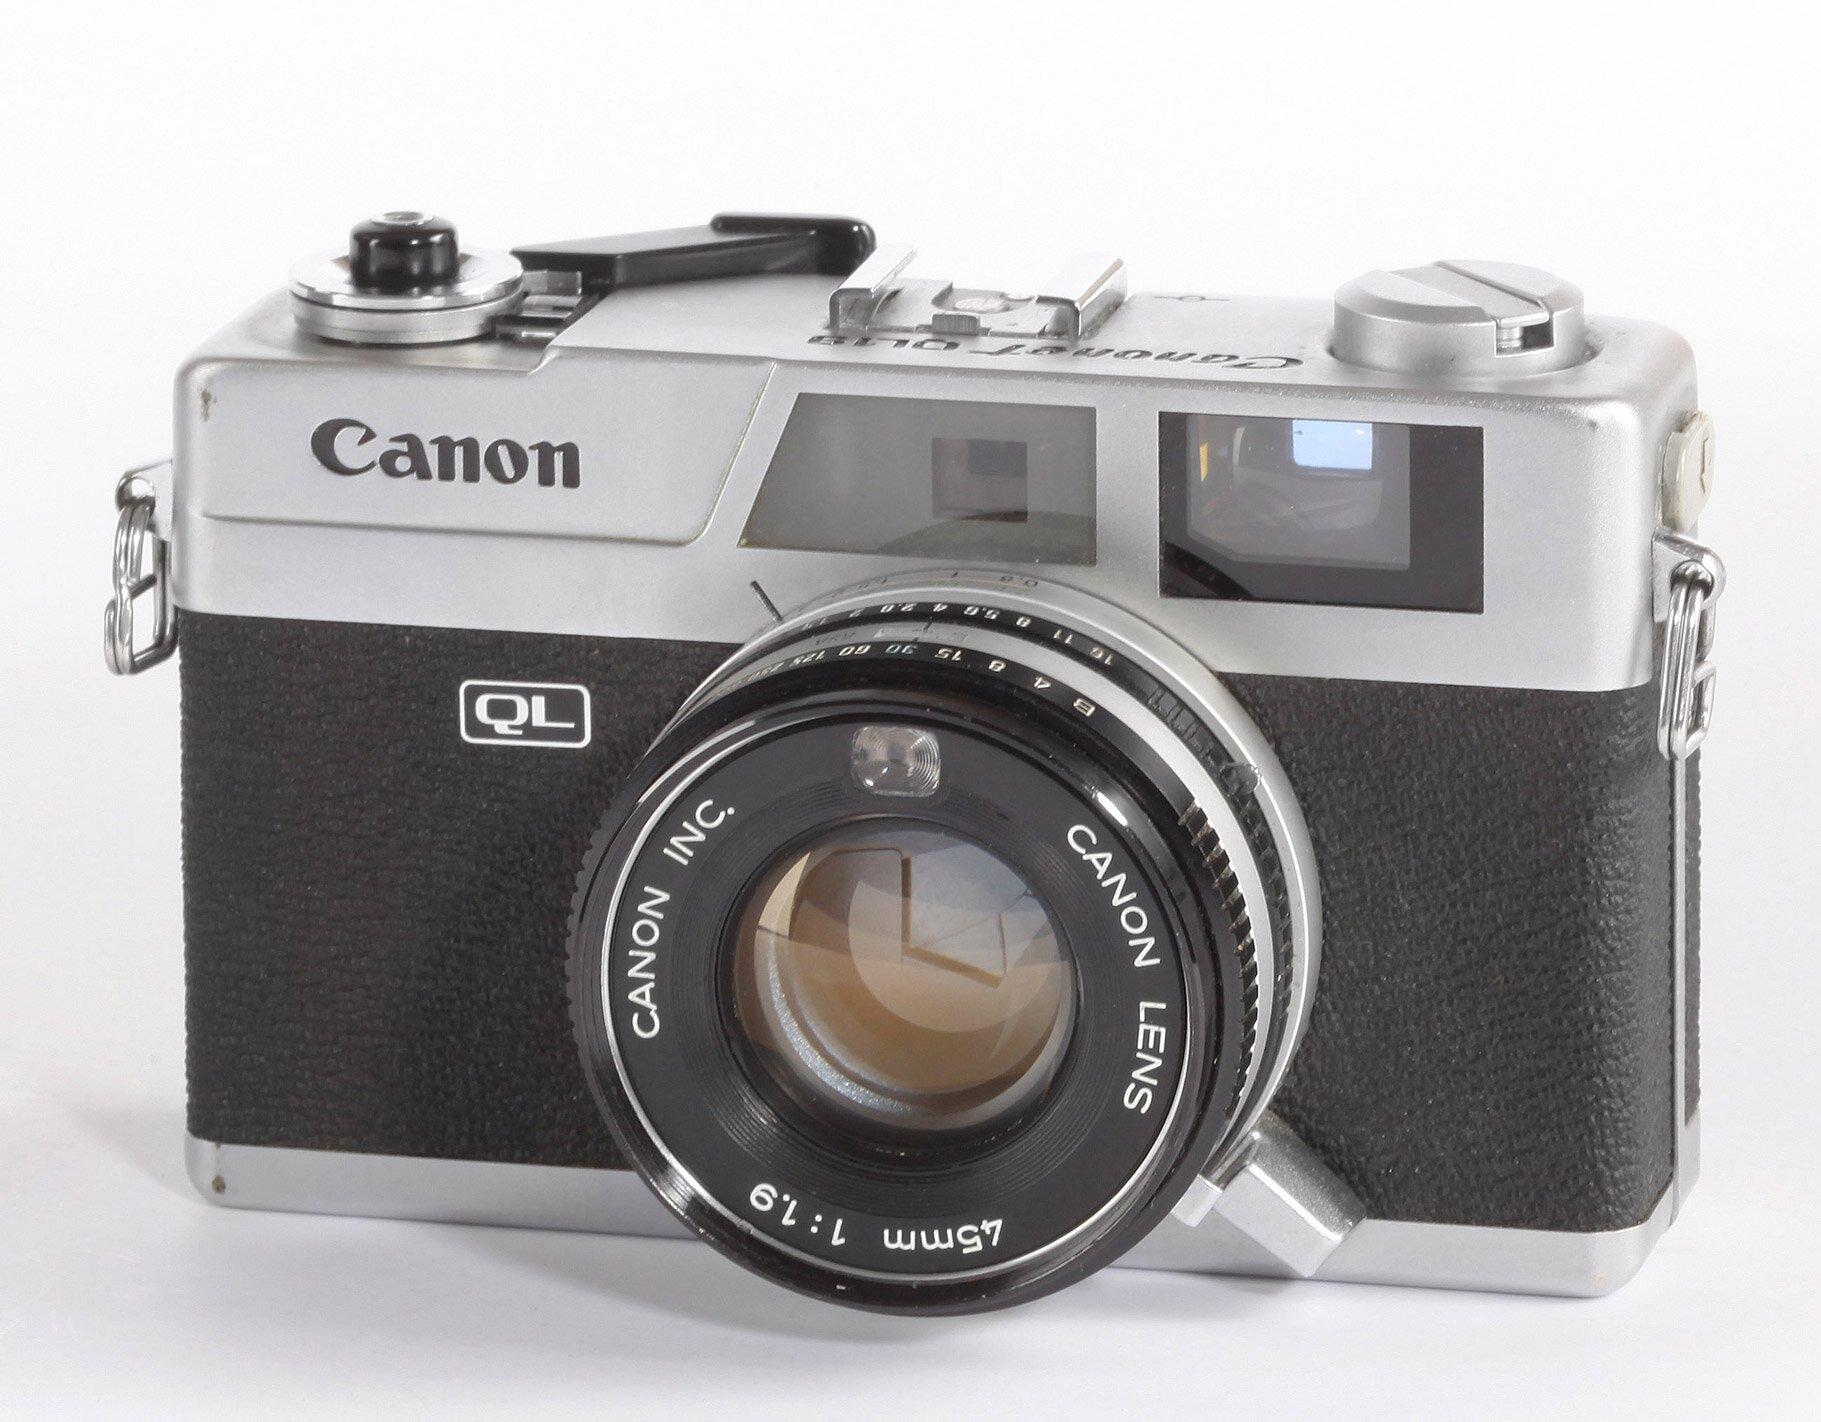 Canon Canonet QL 45mm/1,9